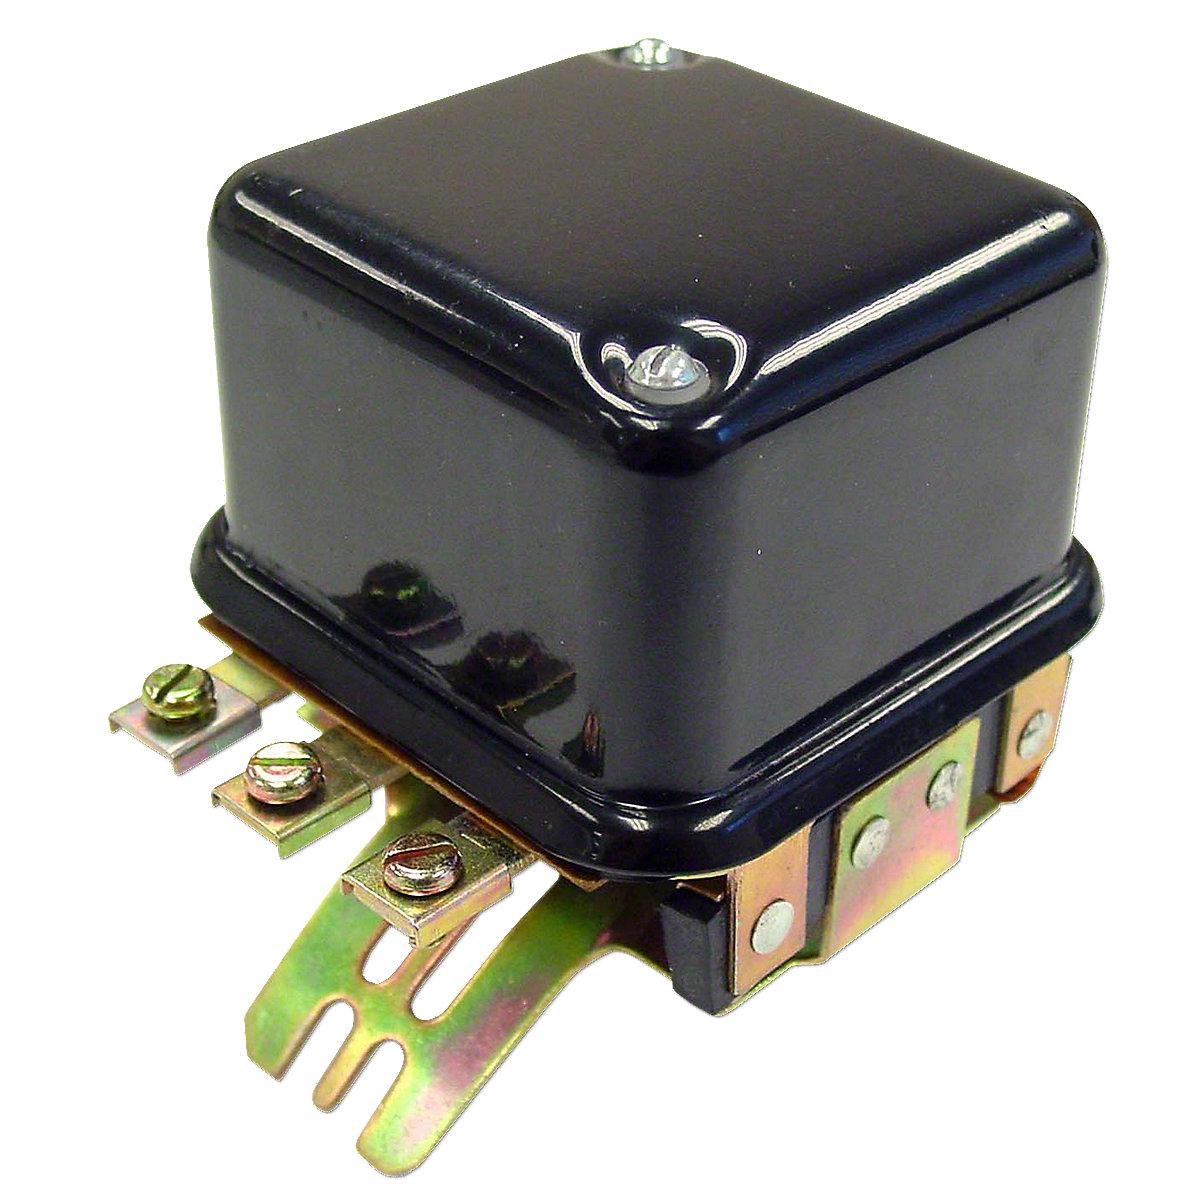 6 Volt Voltage Regulator For Allis Chalmers: B, C, CA, IB, WC, WD, WD45 Gas, WF.